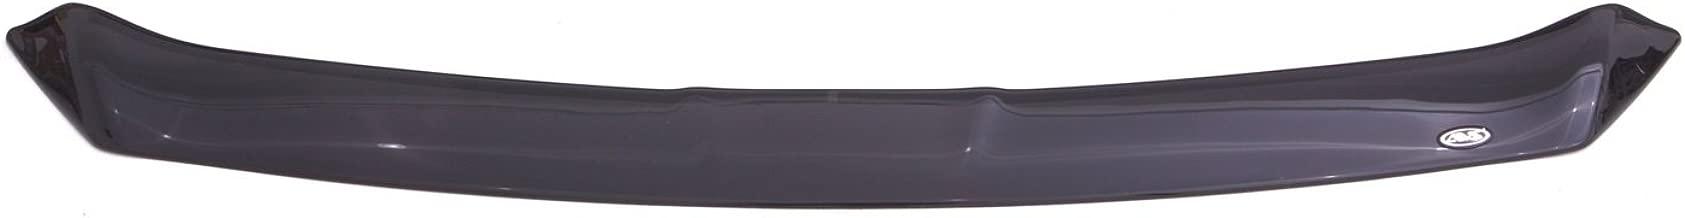 Auto Ventshade 322092 Aeroskin Flush Mount Dark Smoke Hood Protector for 2013-2016 Ford Escape